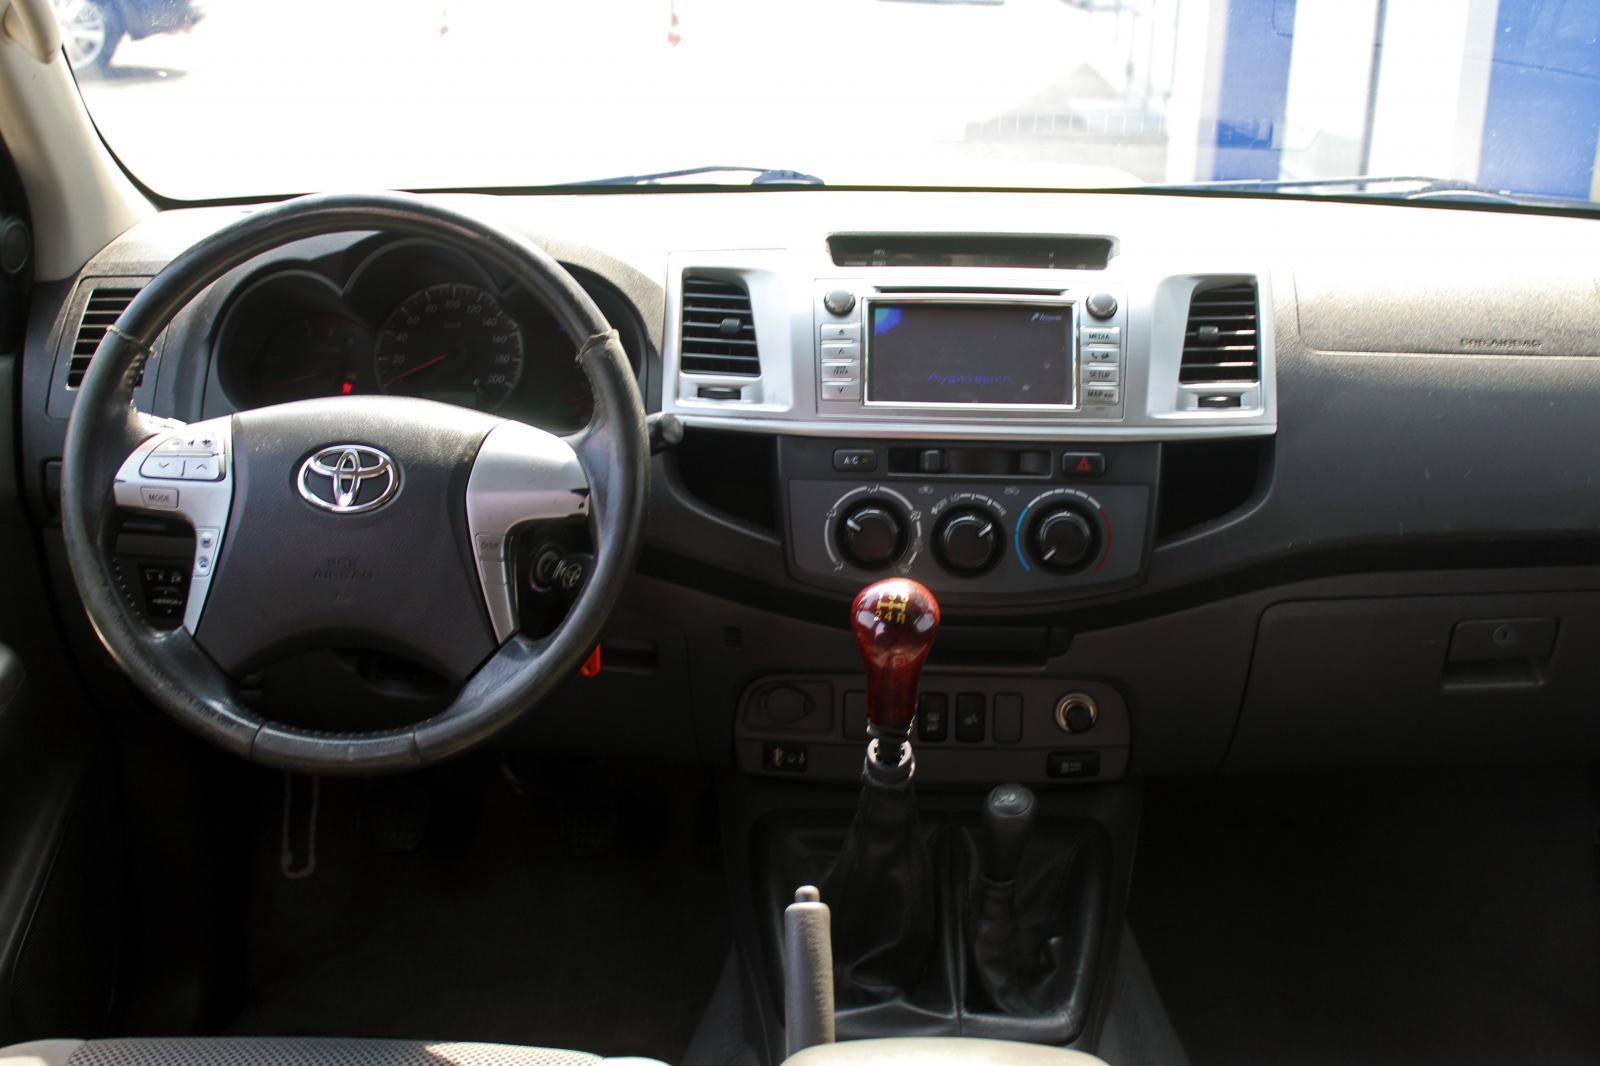 Toyota Hilux, VII Рестайлинг 2012г.